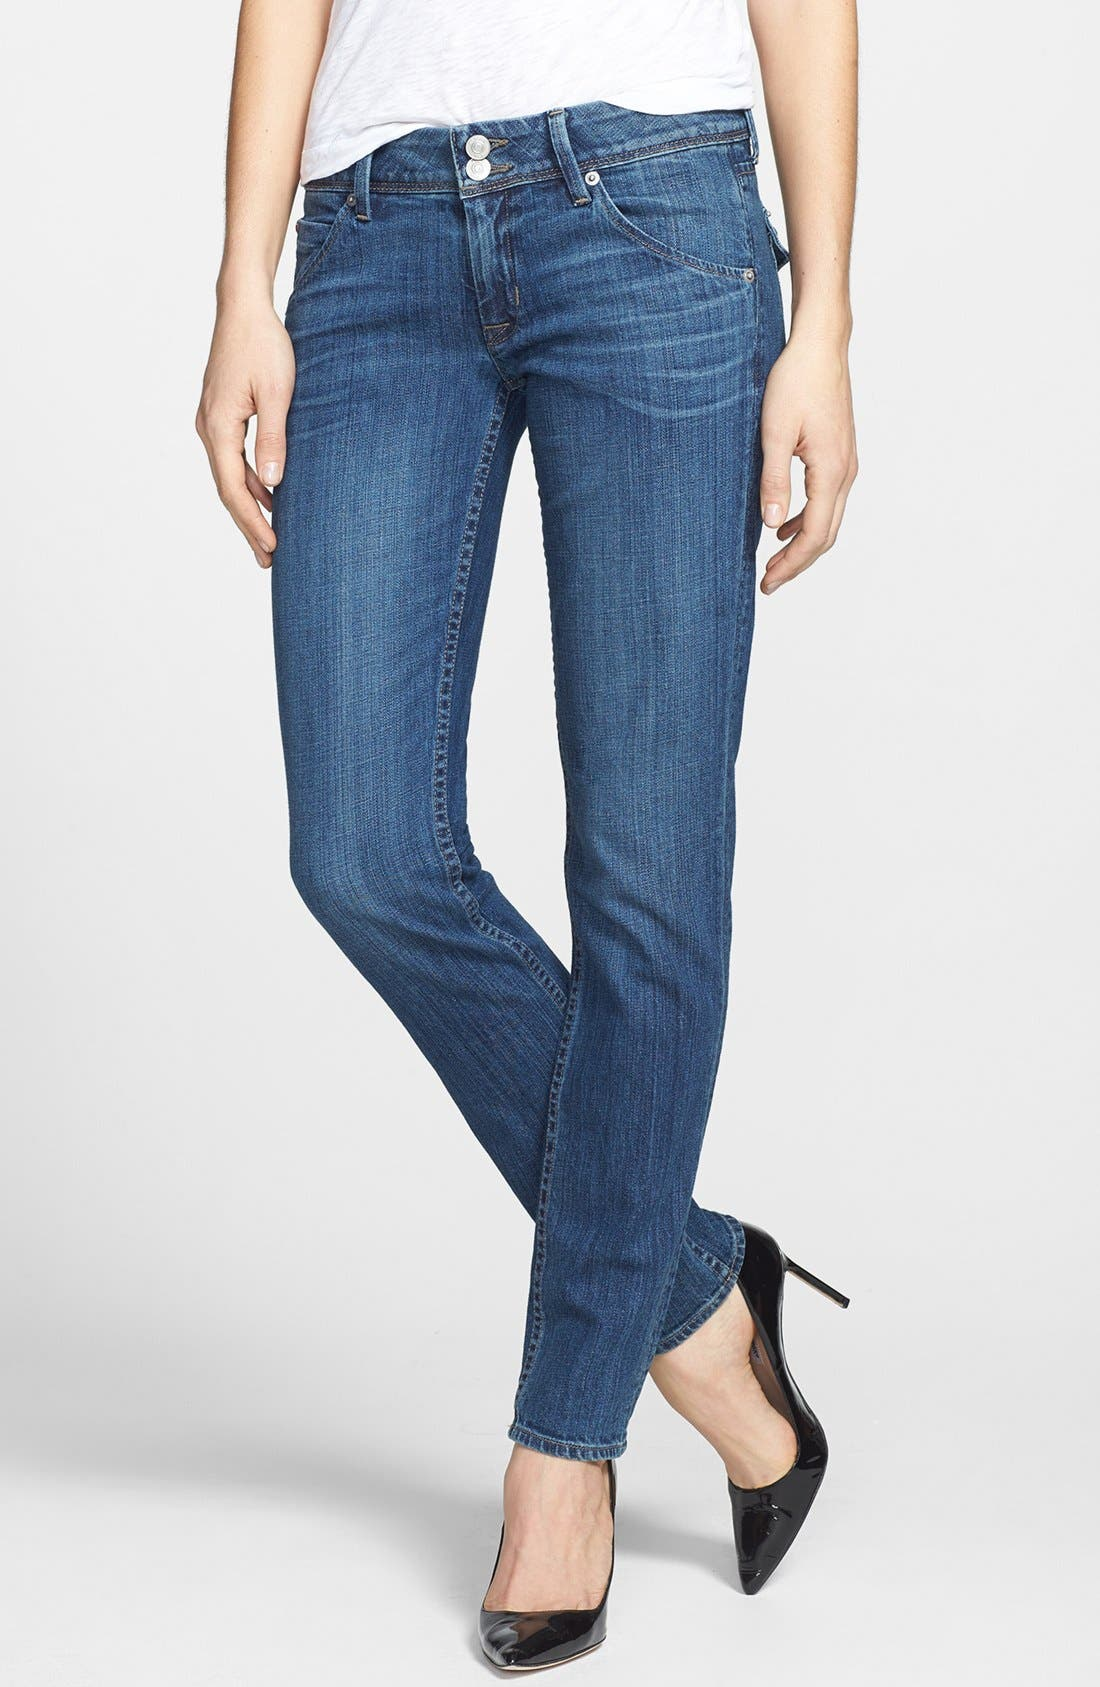 Main Image - Hudson Jeans 'Collin' Skinny Jeans (Prodigy)